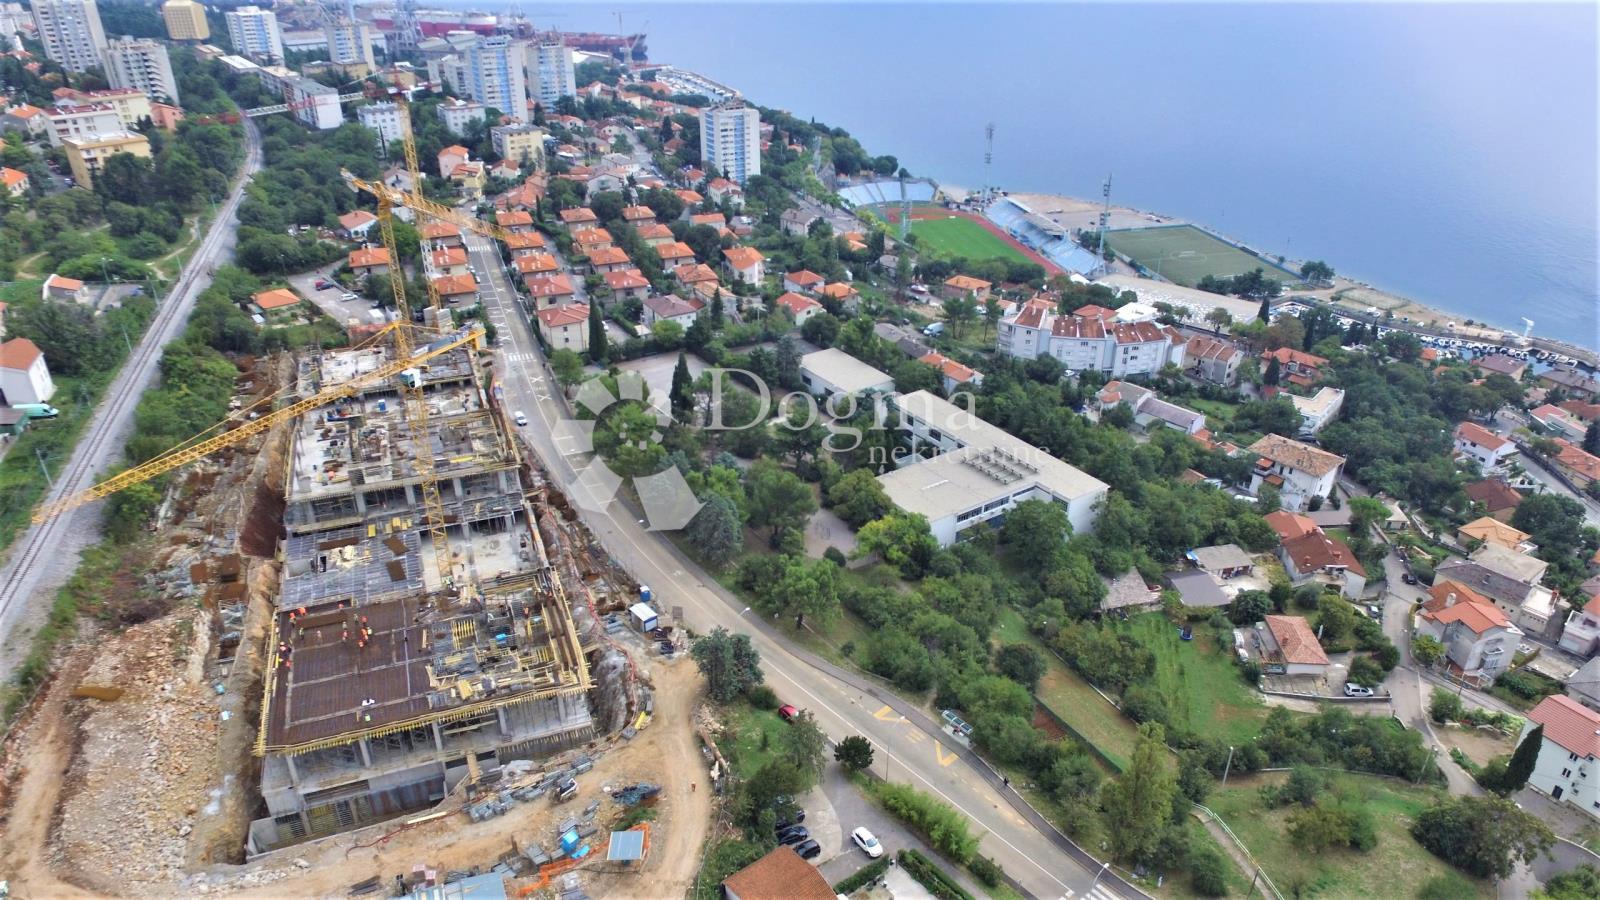 gradnja-stanova-kantrida-rio